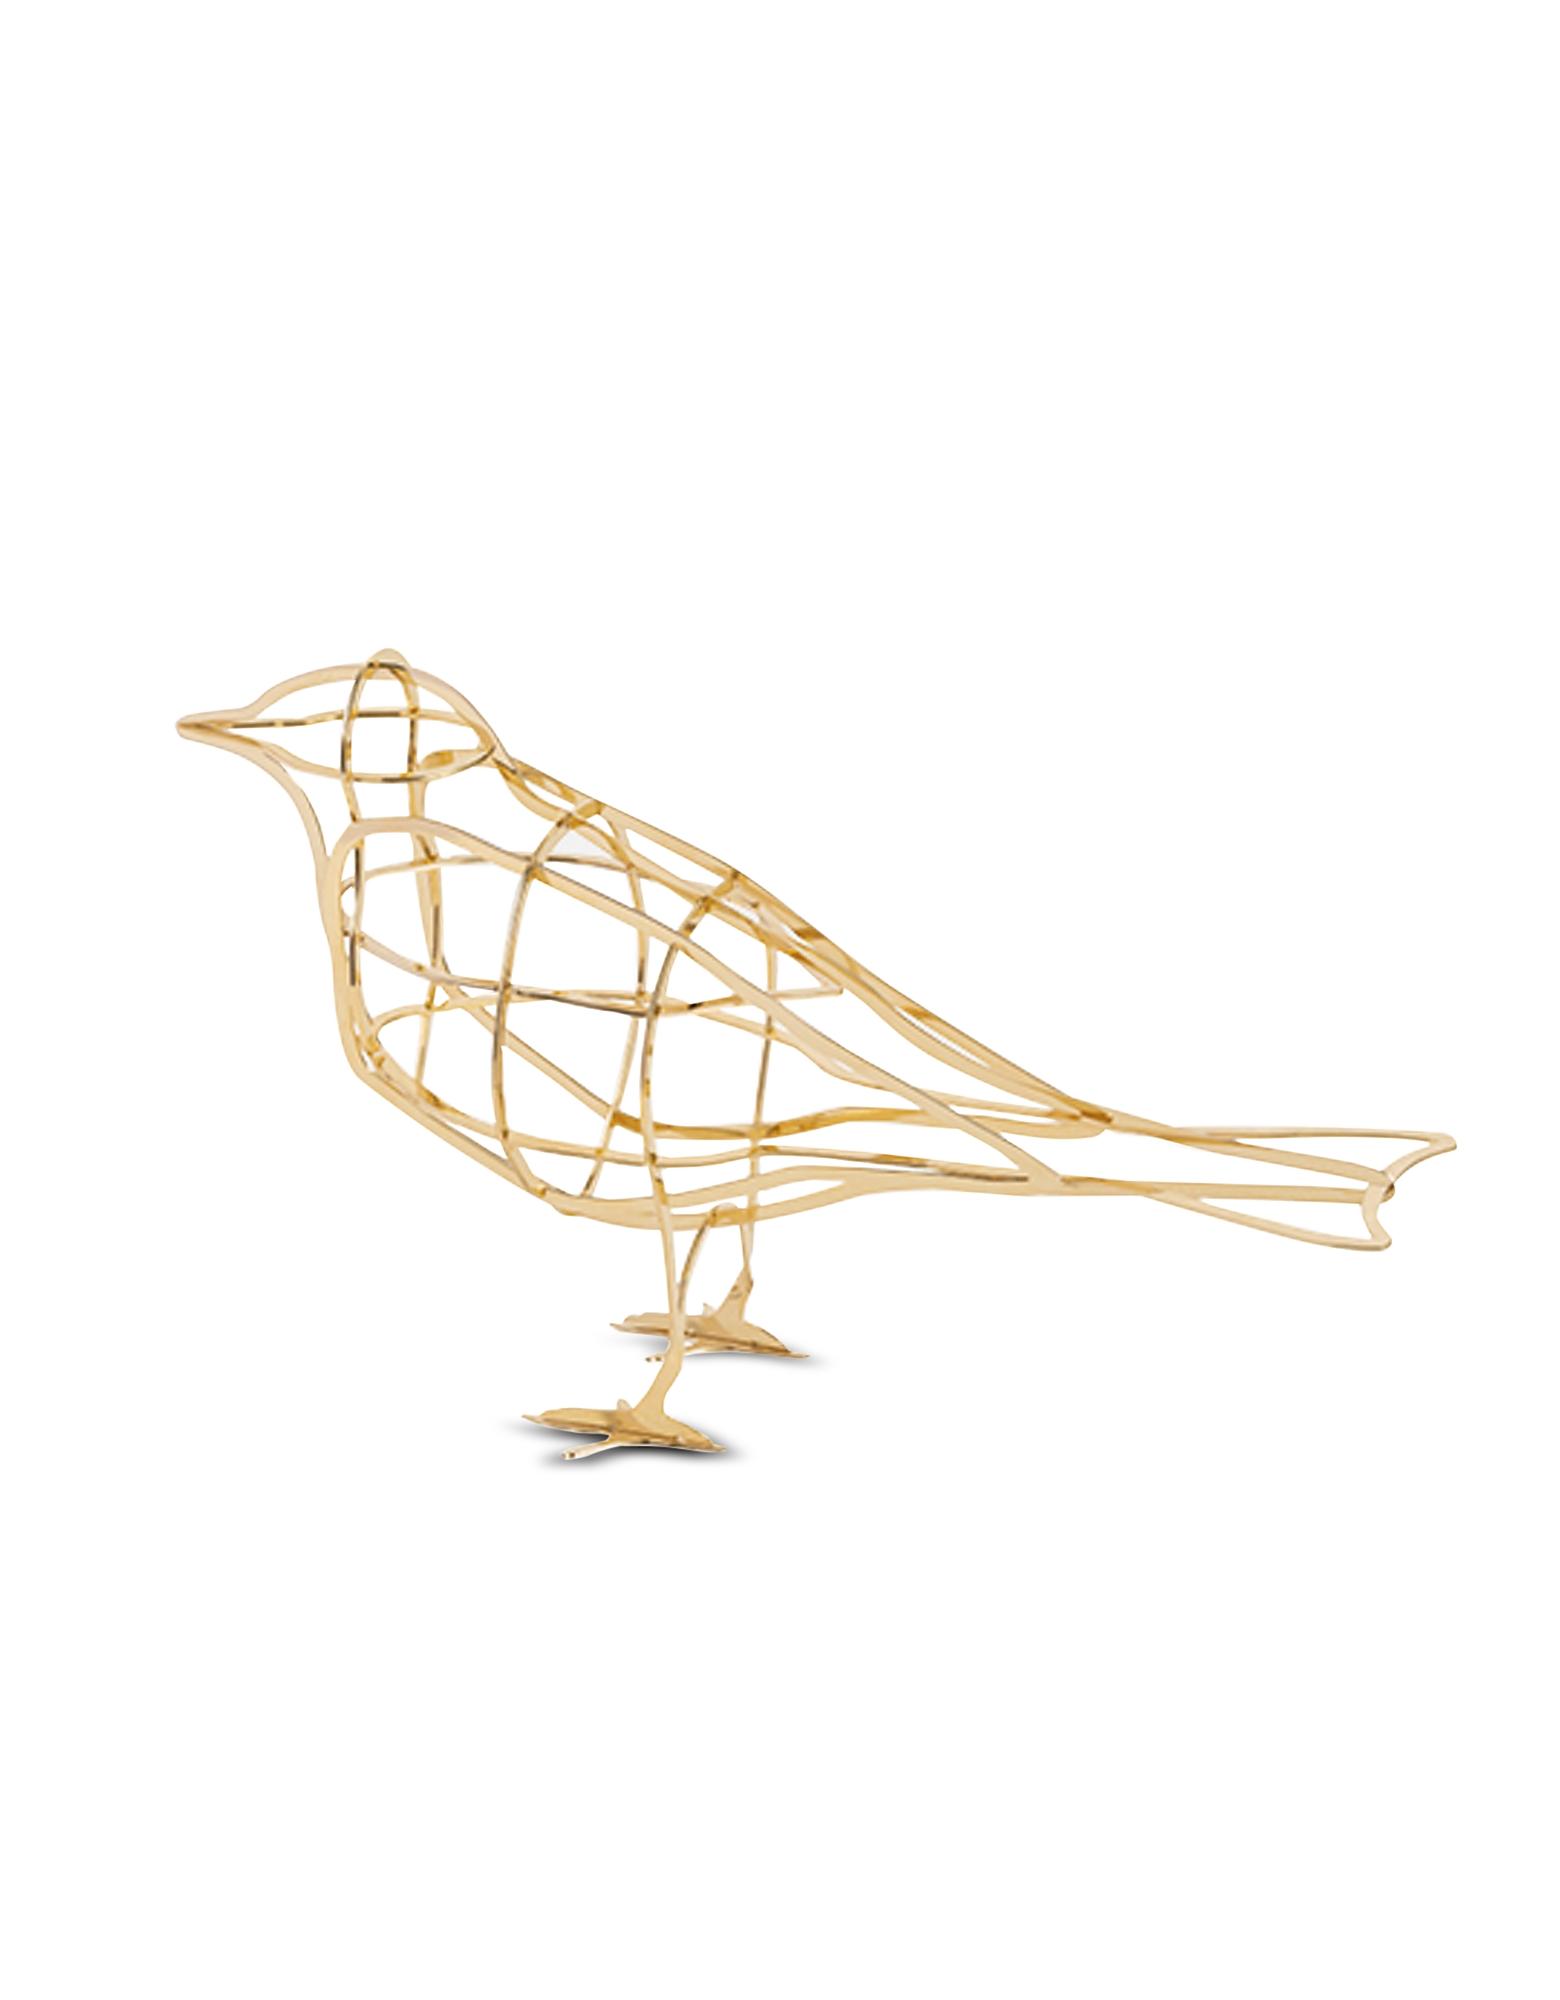 Ibride Designer Decor & Lighting, Petites Présences De L'Aube Gold-tone Metal Decorative Bird